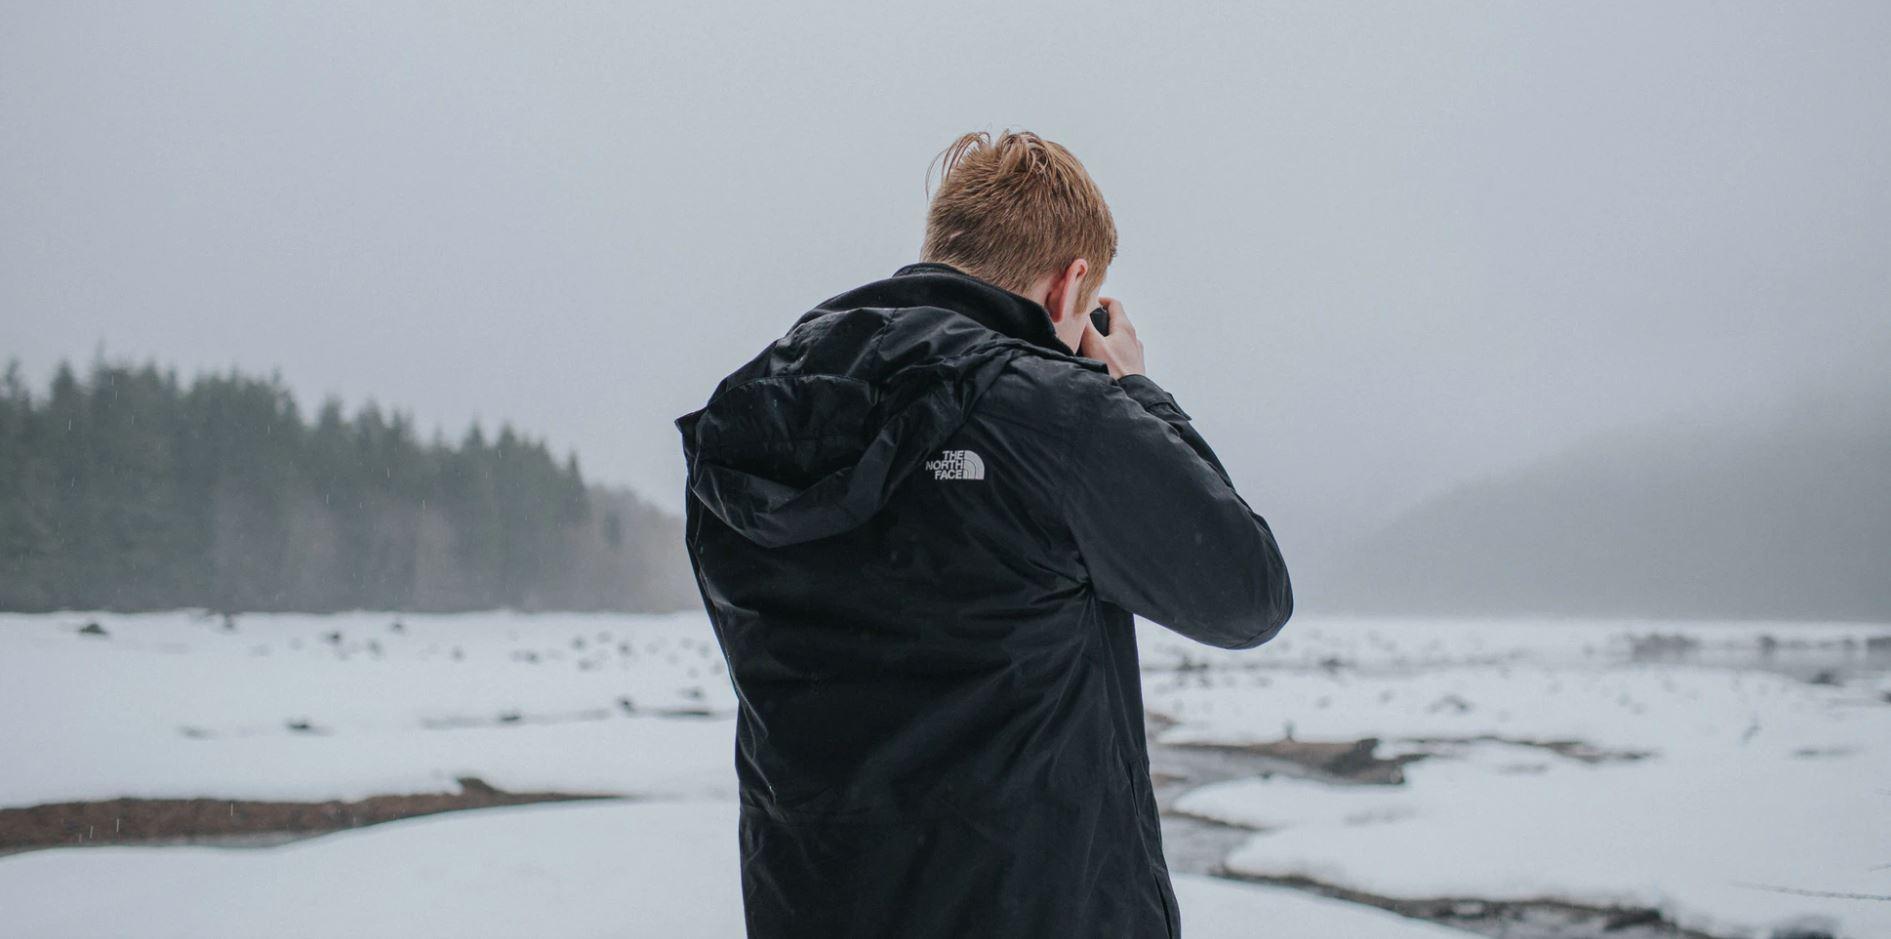 Outdoor- und Wandermarke: The North Face